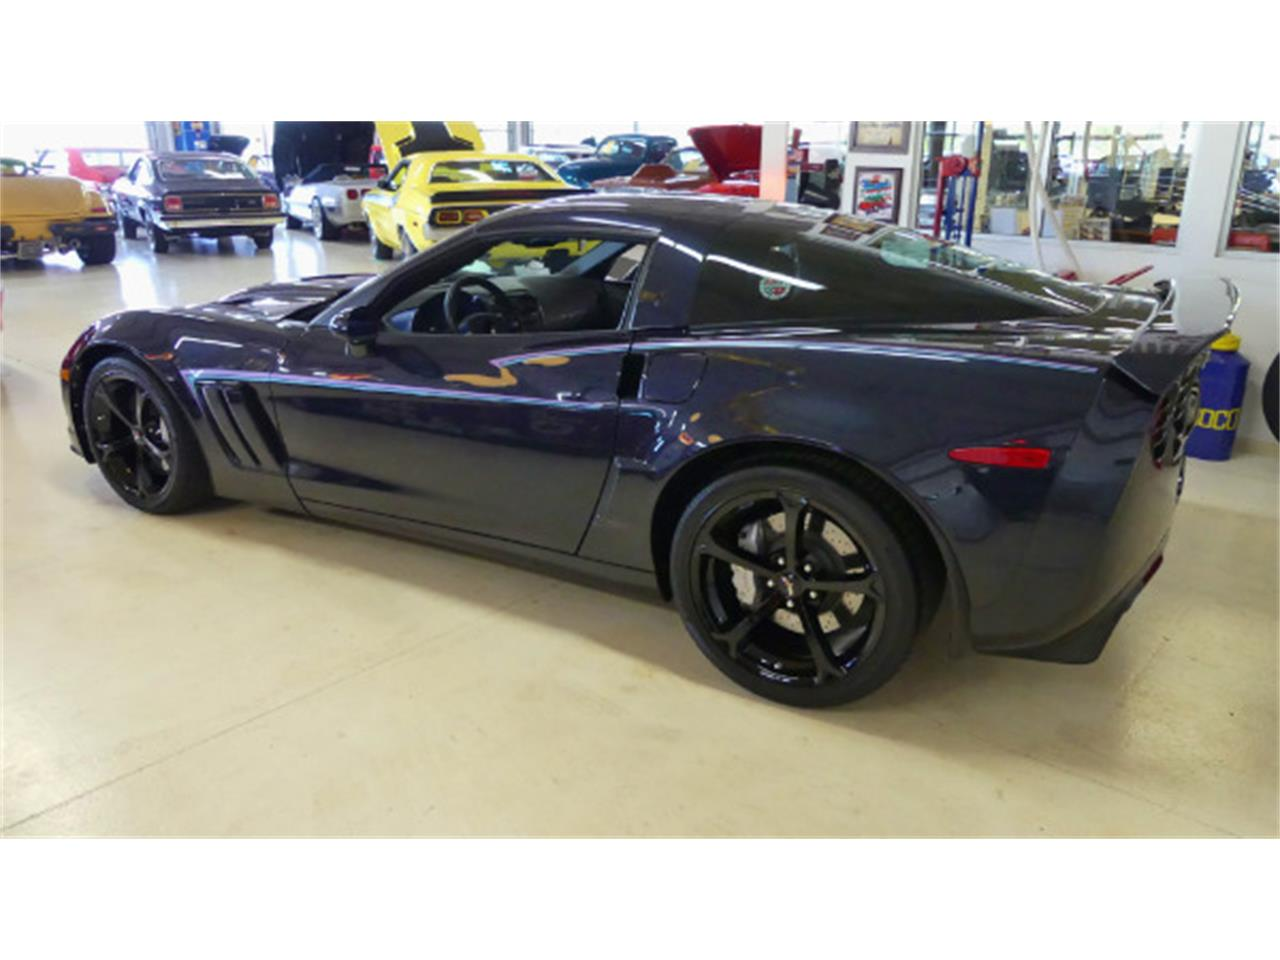 Large Picture of 2013 Corvette located in Columbus Ohio - $45,895.00 - L3E0